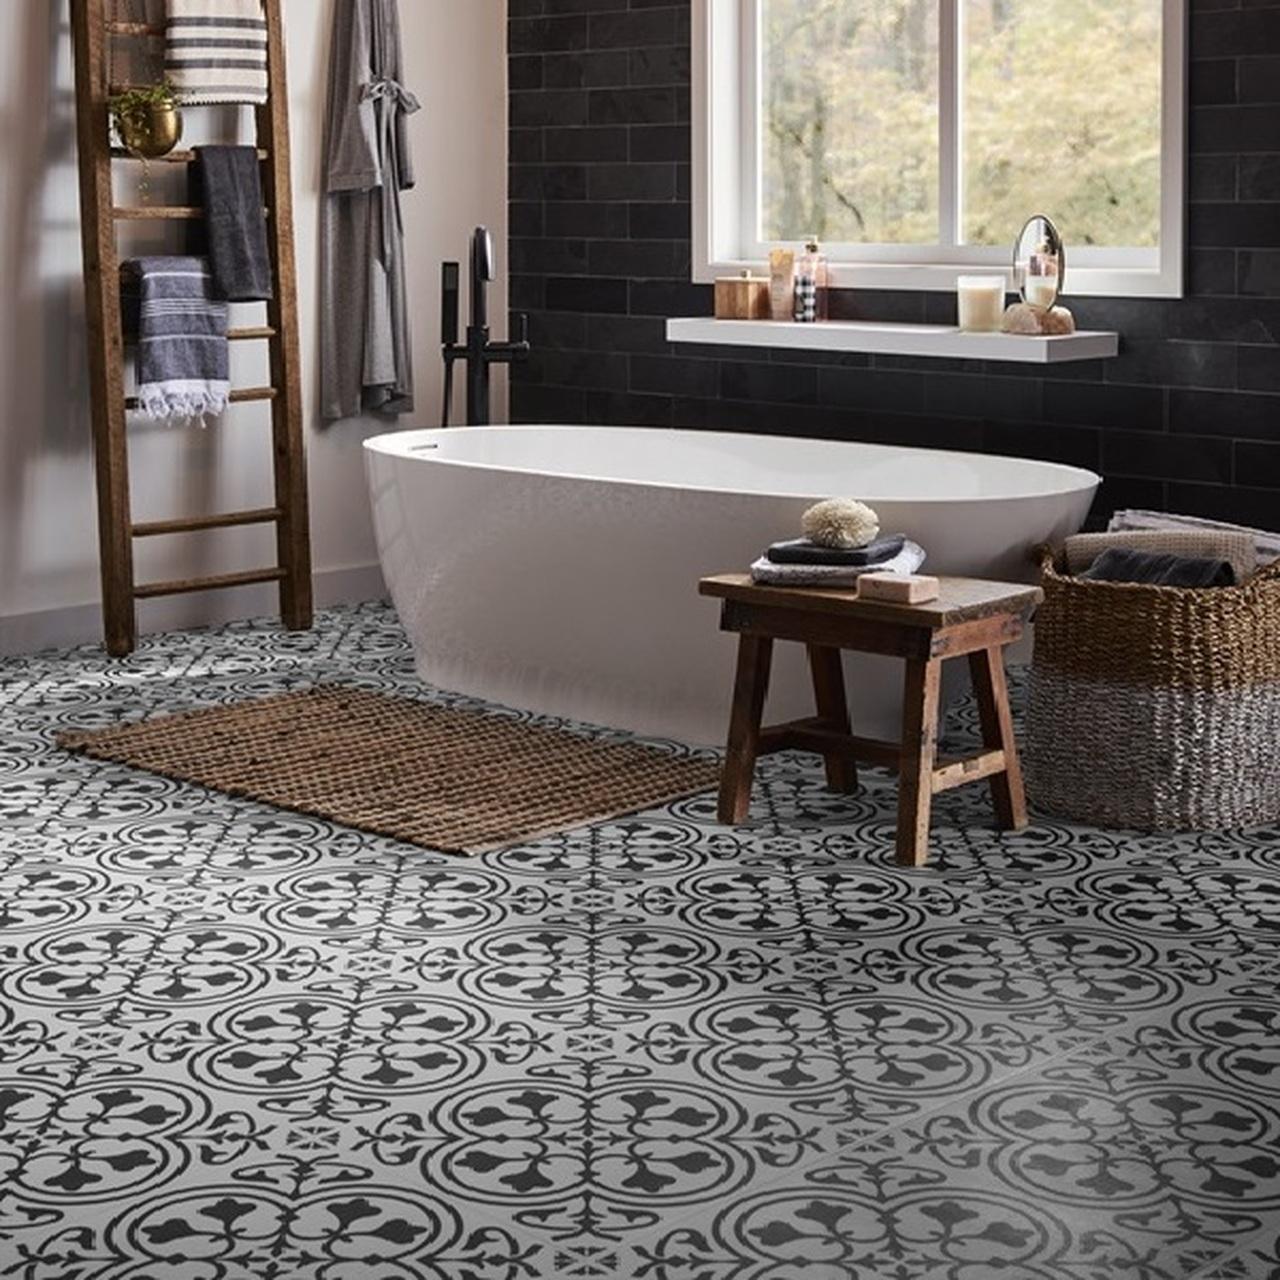 luxury vinyl tile the best bathroom floor